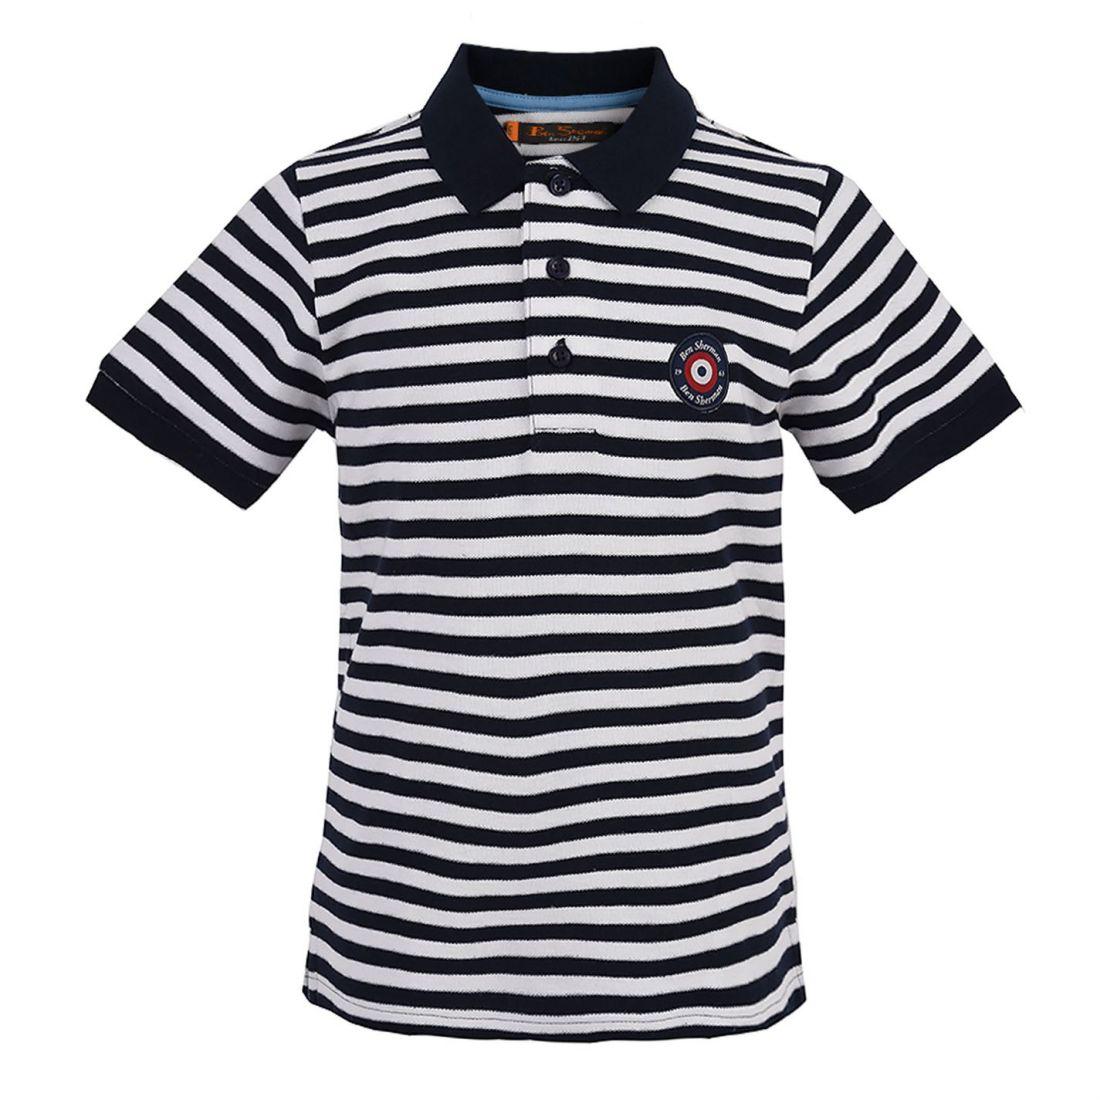 920259d8c Kids Ben Sherman Stripe Target Polo Shirt Classic Fit Short Sleeve ...